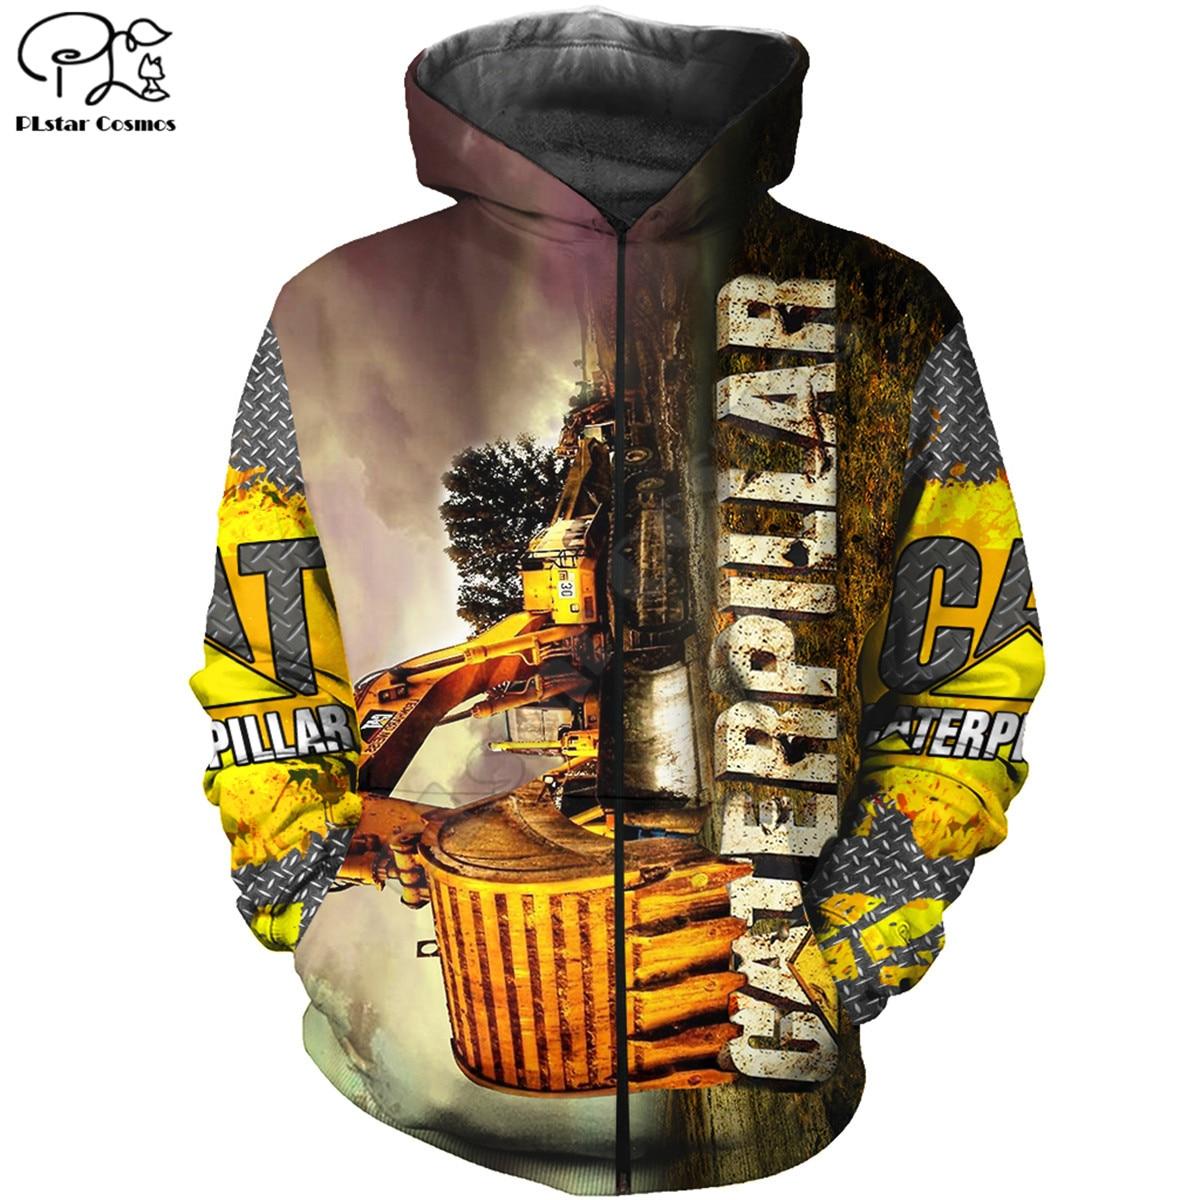 3d caterpillar heavy-equipment hoodies 3D printed Sweatshirt Hoodie Harajuku Autumn Streetwear women men Casual Tracksuit